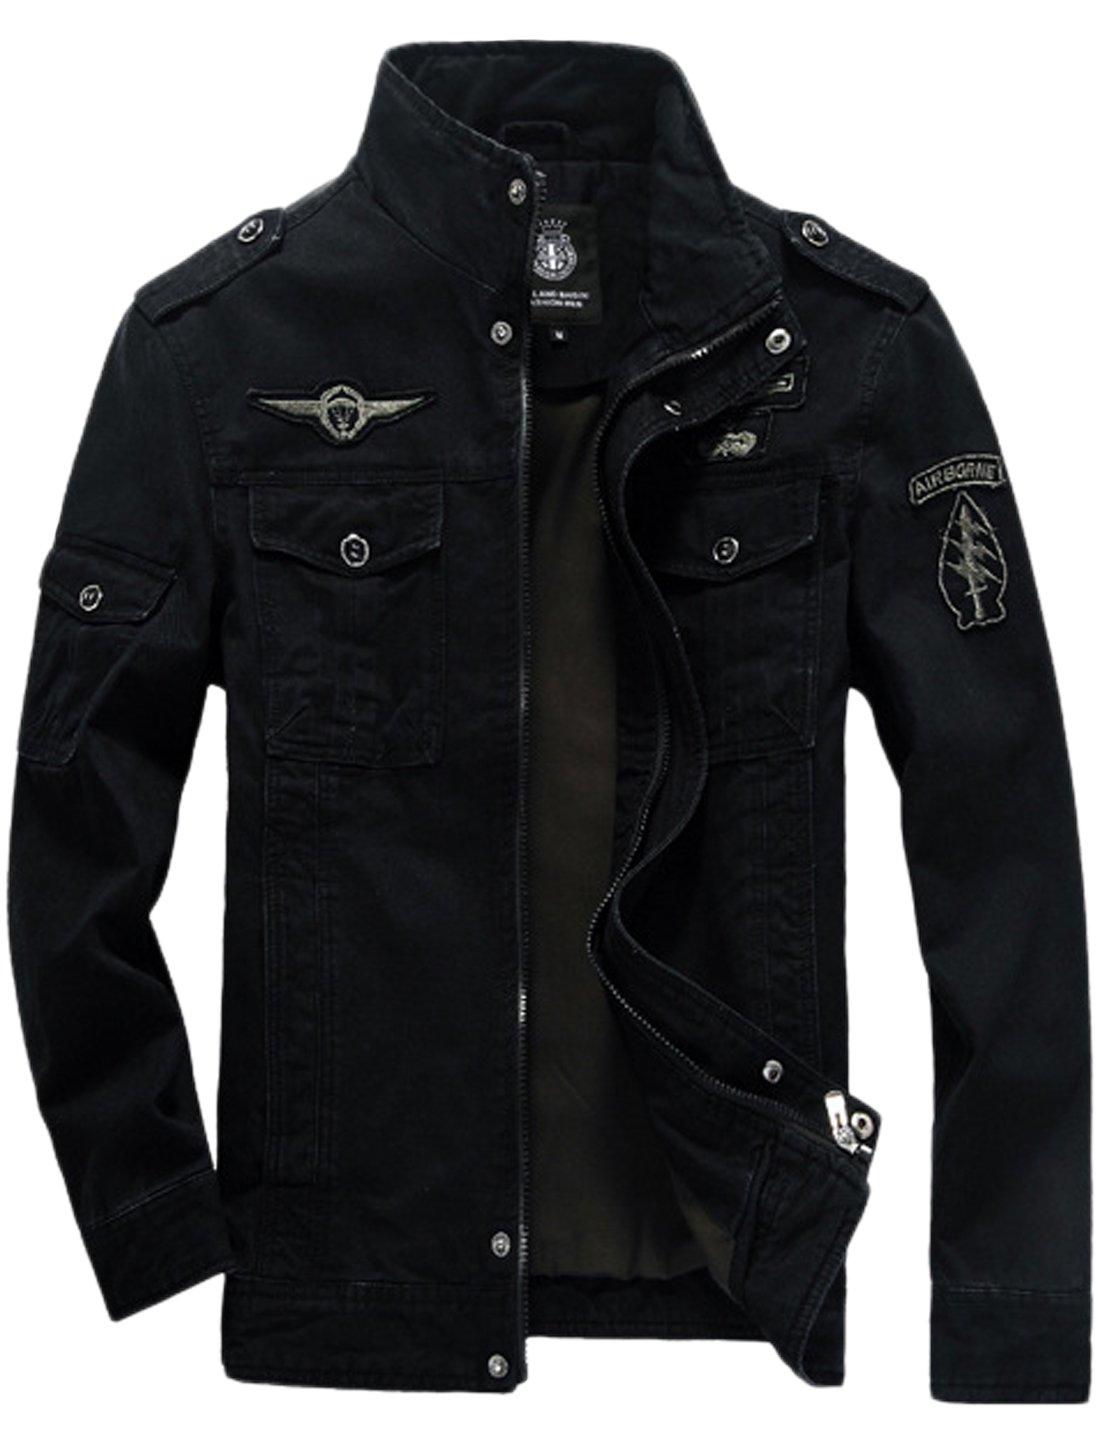 Springrain Men's Casual Slim Stand Collar Tooling Cotton Jackets (Medium, Black) by Springrain